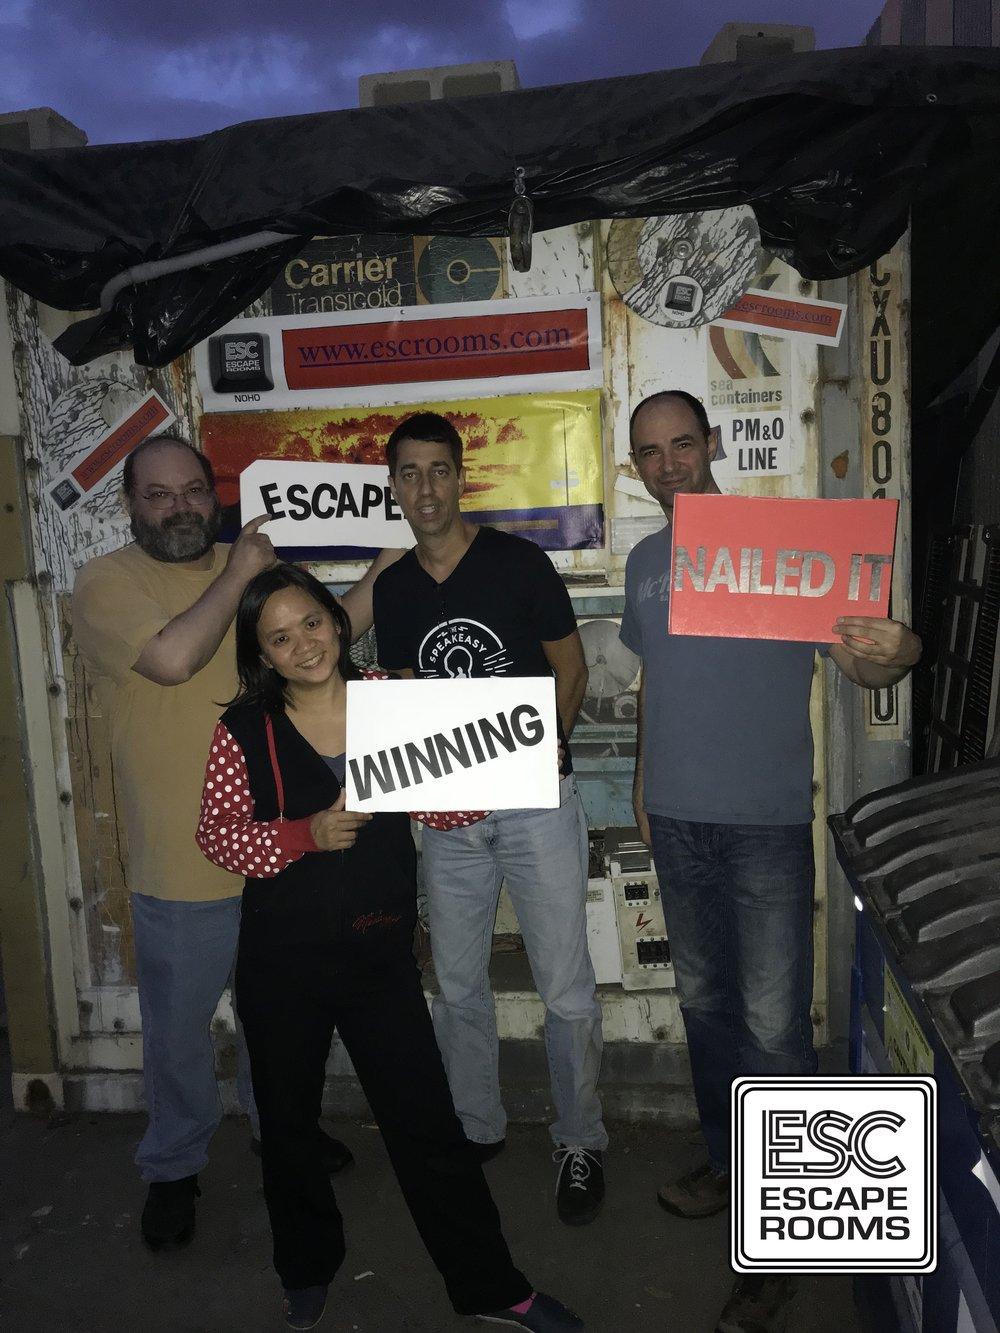 team-scytale-esc-escape-rooms.jpeg